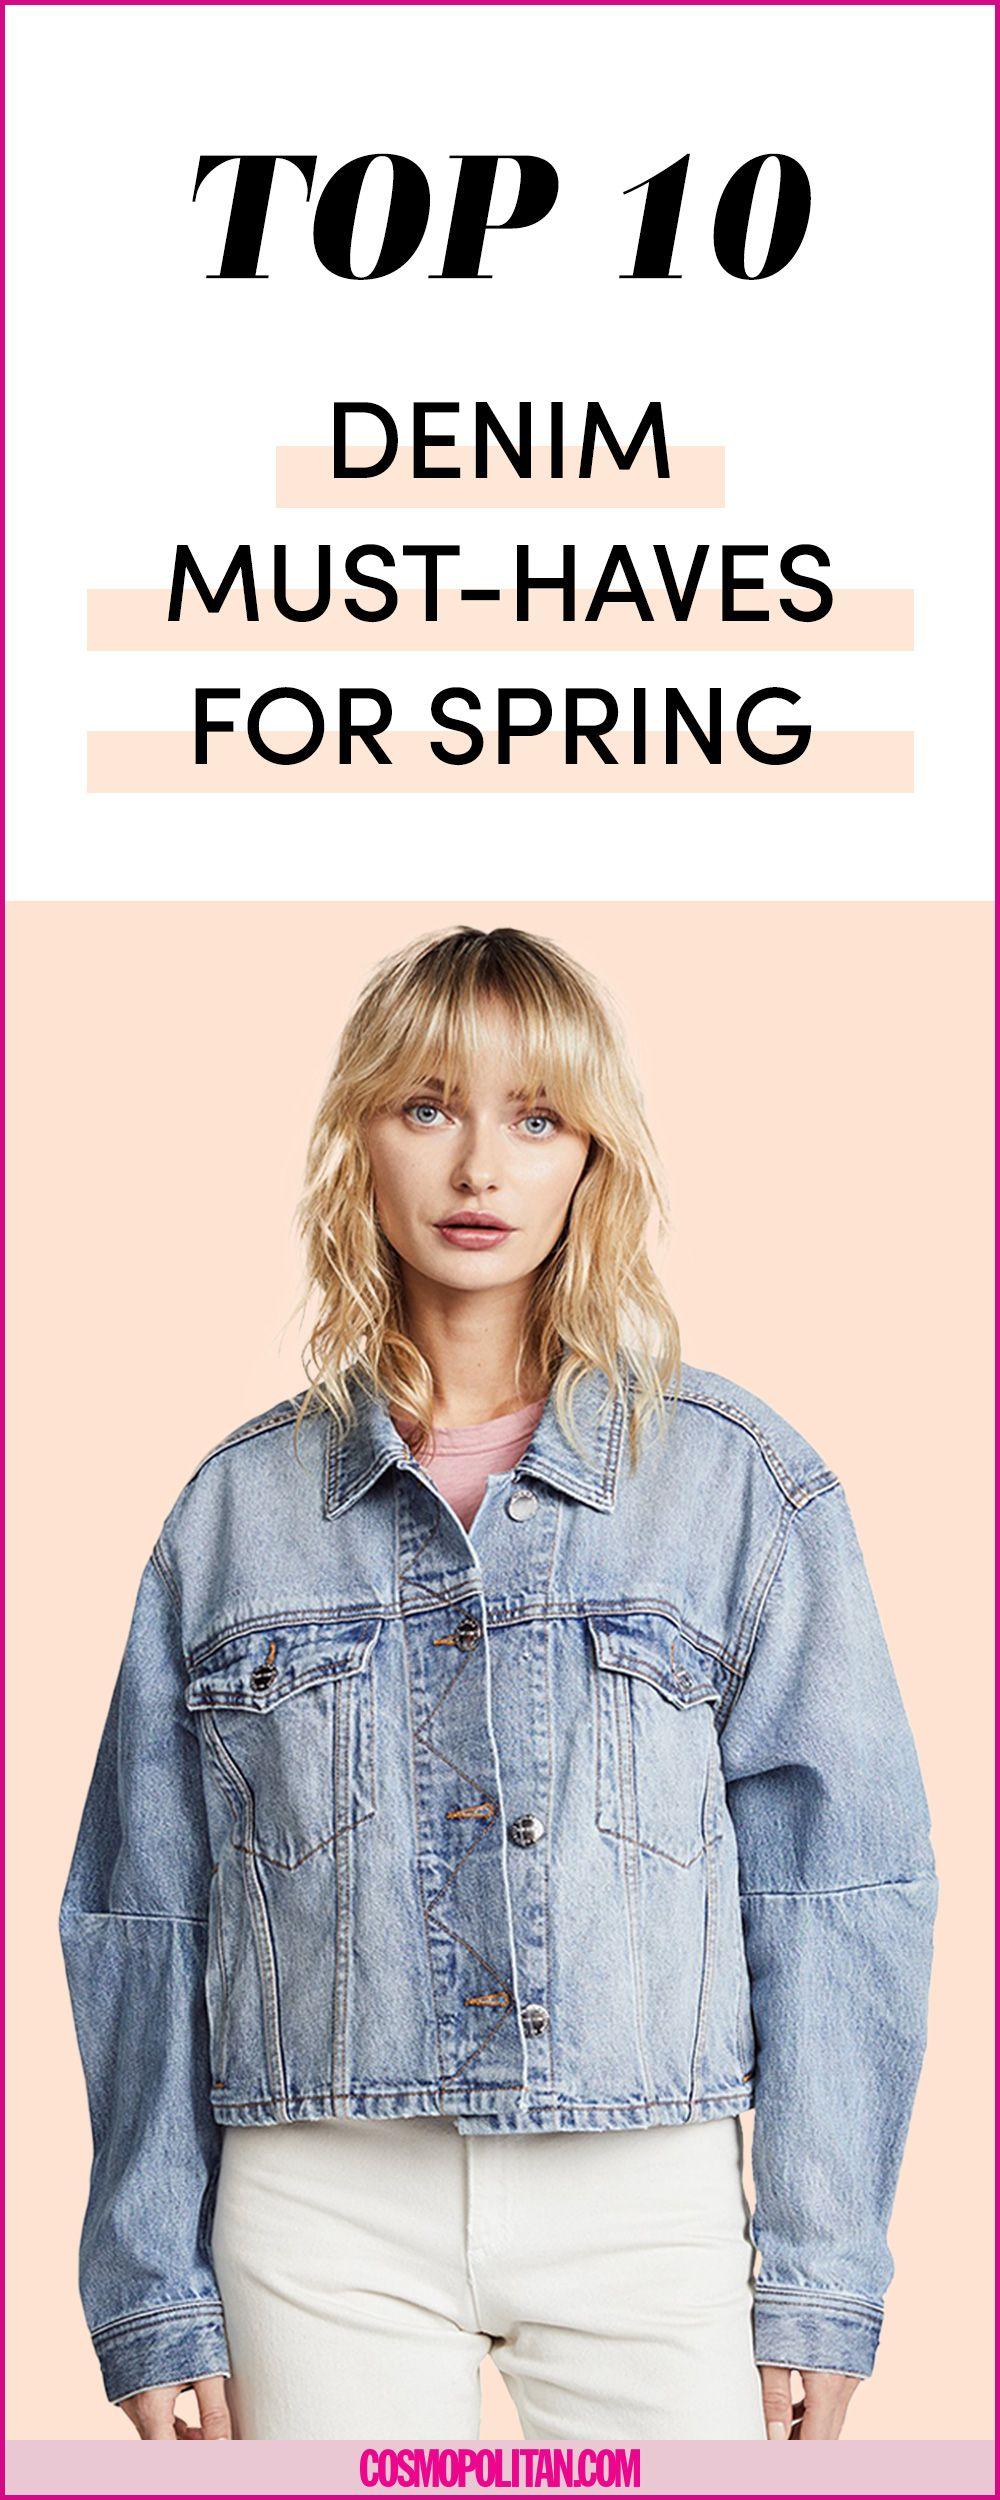 Amazon Denim Buys - How to Shop for Denim